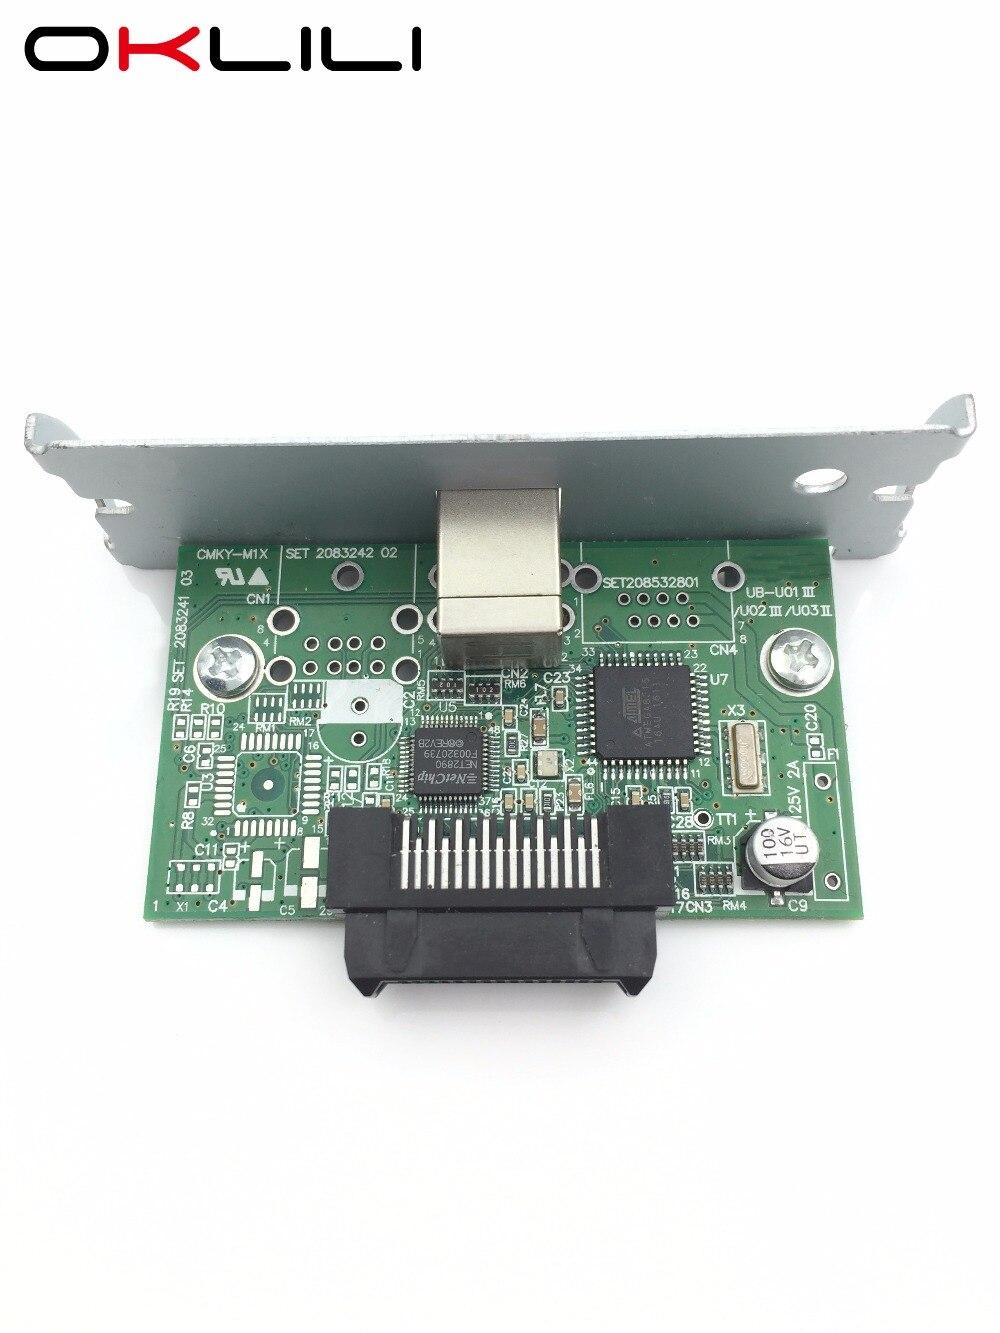 NEW C32C824131 M148E USB Port Interface Card for Epson TM-H5000II H6000IV J7000 J7100 J7500 J7600 L90 T70 T88IV T88V T90 U220 usb port interface card for epson tm h5000ii h6000iv j7000 j7100 j7500 j7600 l90 t70 t88iv t88v t90 u220 a187 u230 u325 u200